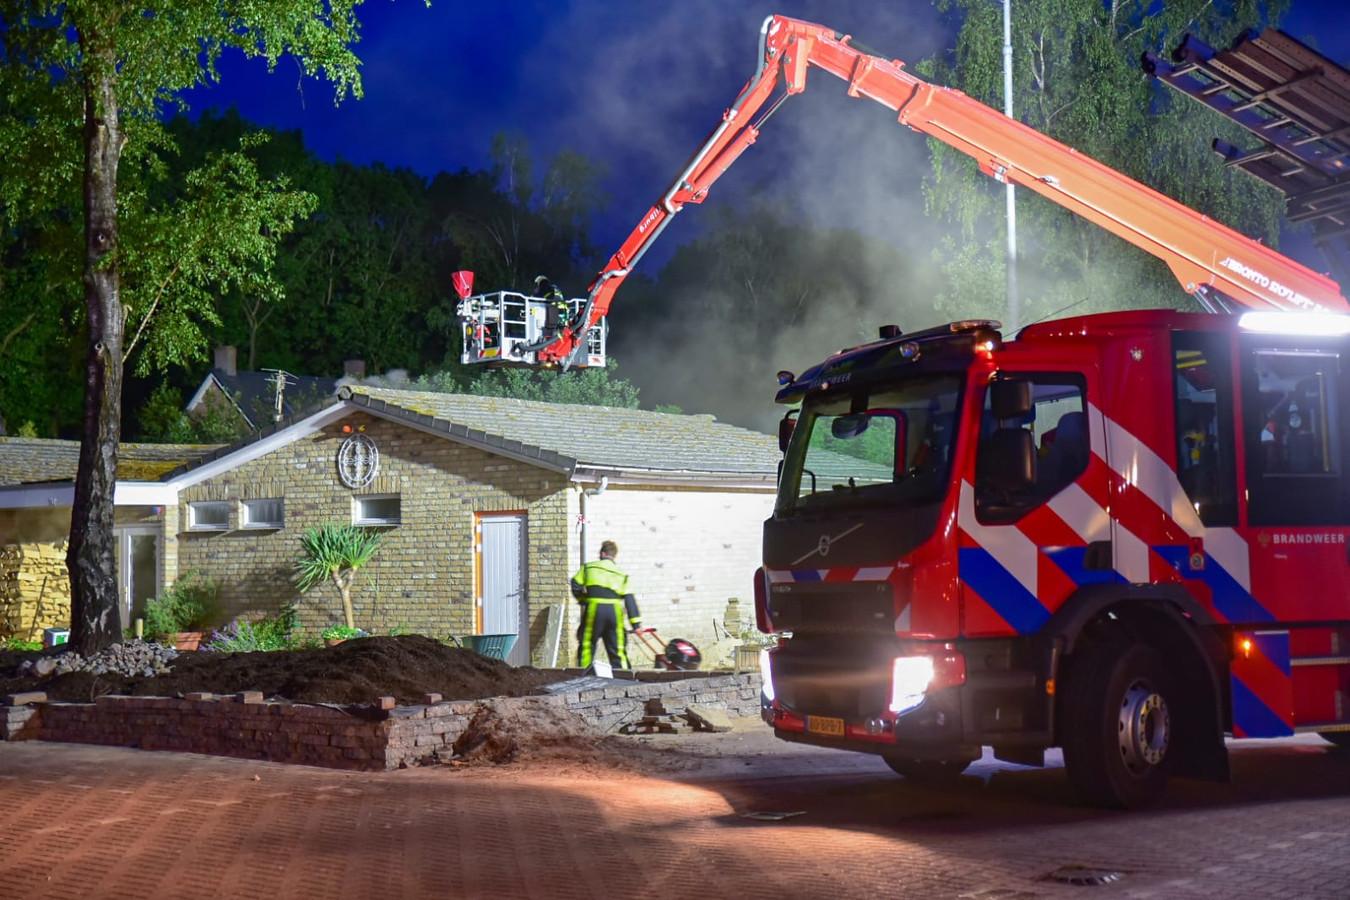 Brand bij Italiaans restaurant Giardino d'Italia in Tilburg.